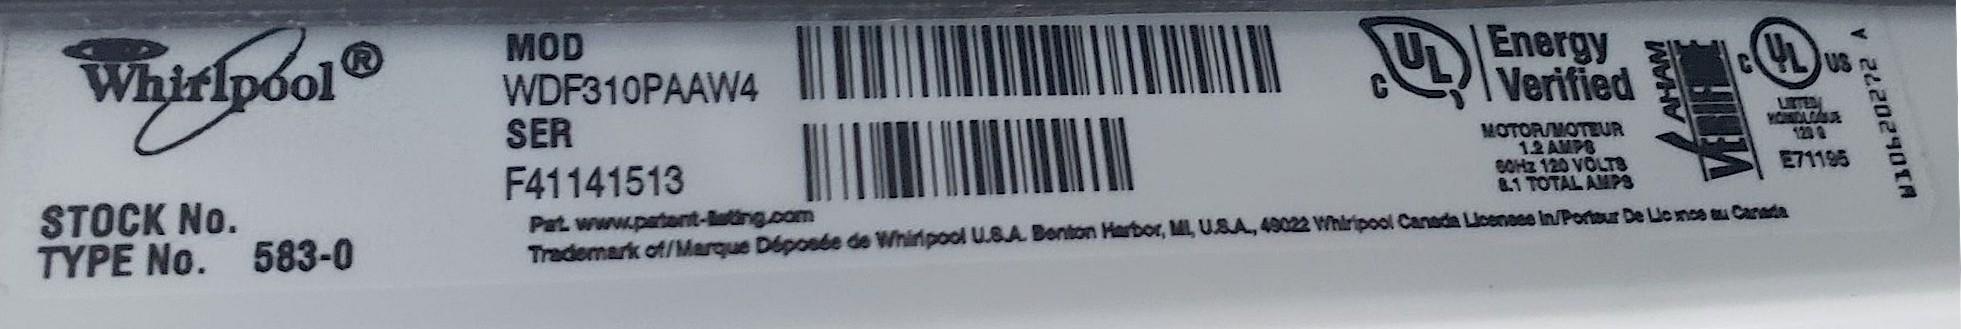 1 White Whirlpool Dishwasher Model Number